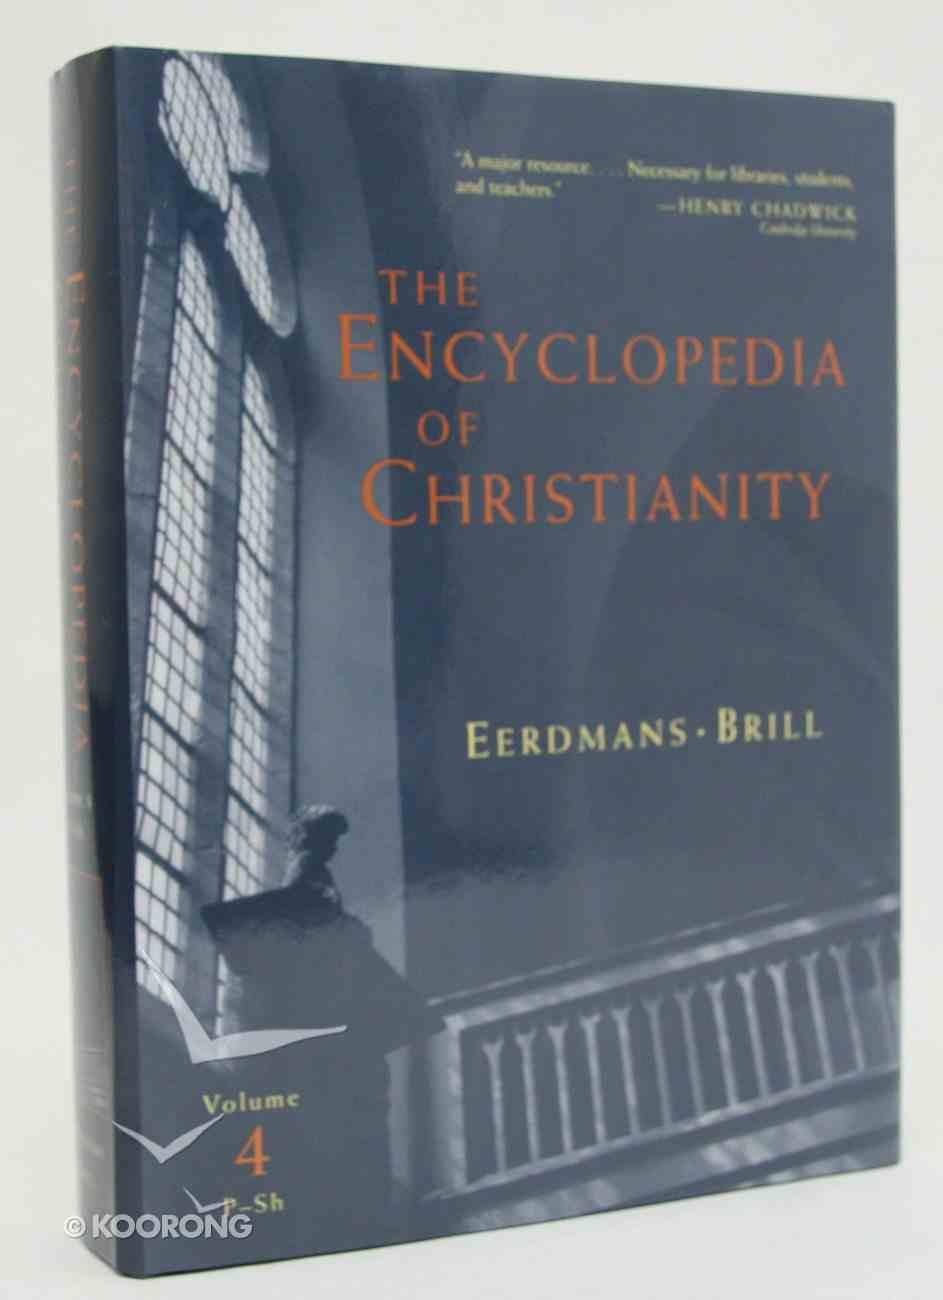 The Encyclopedia of Christianity (Vol 4: P-sh) Hardback